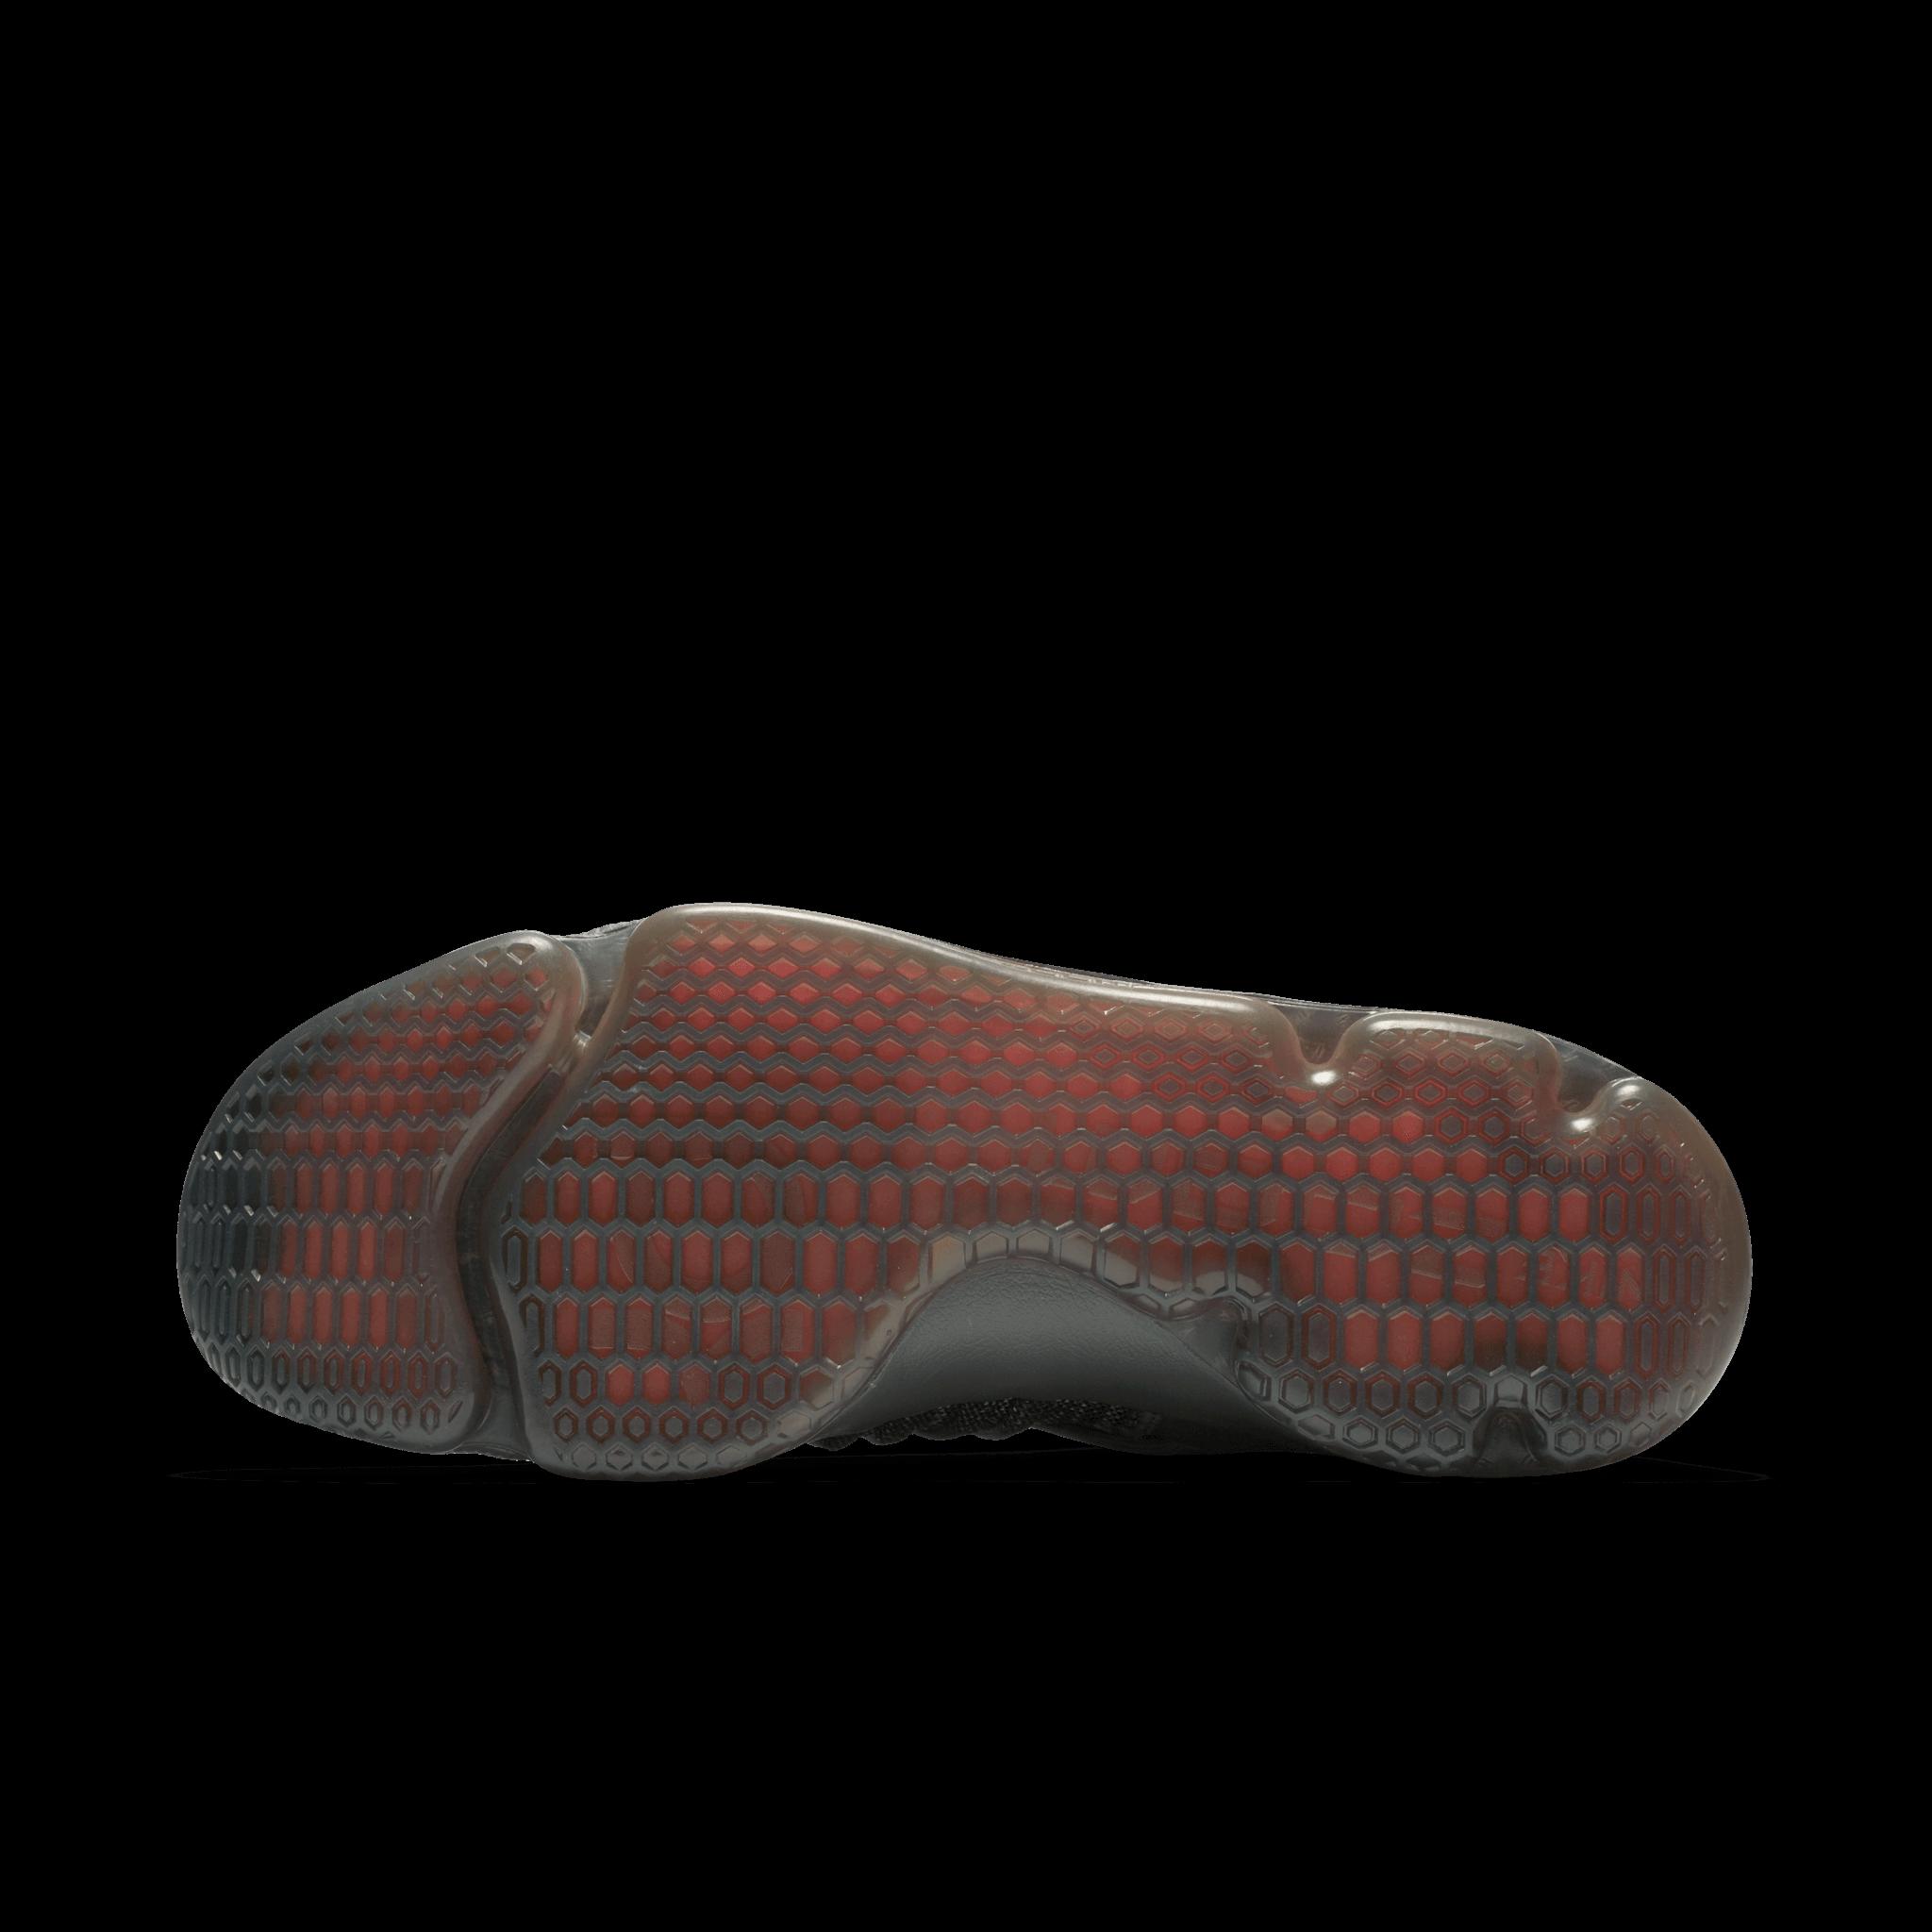 c32cc5d25fd Nike KD 9 Elite Performance Review